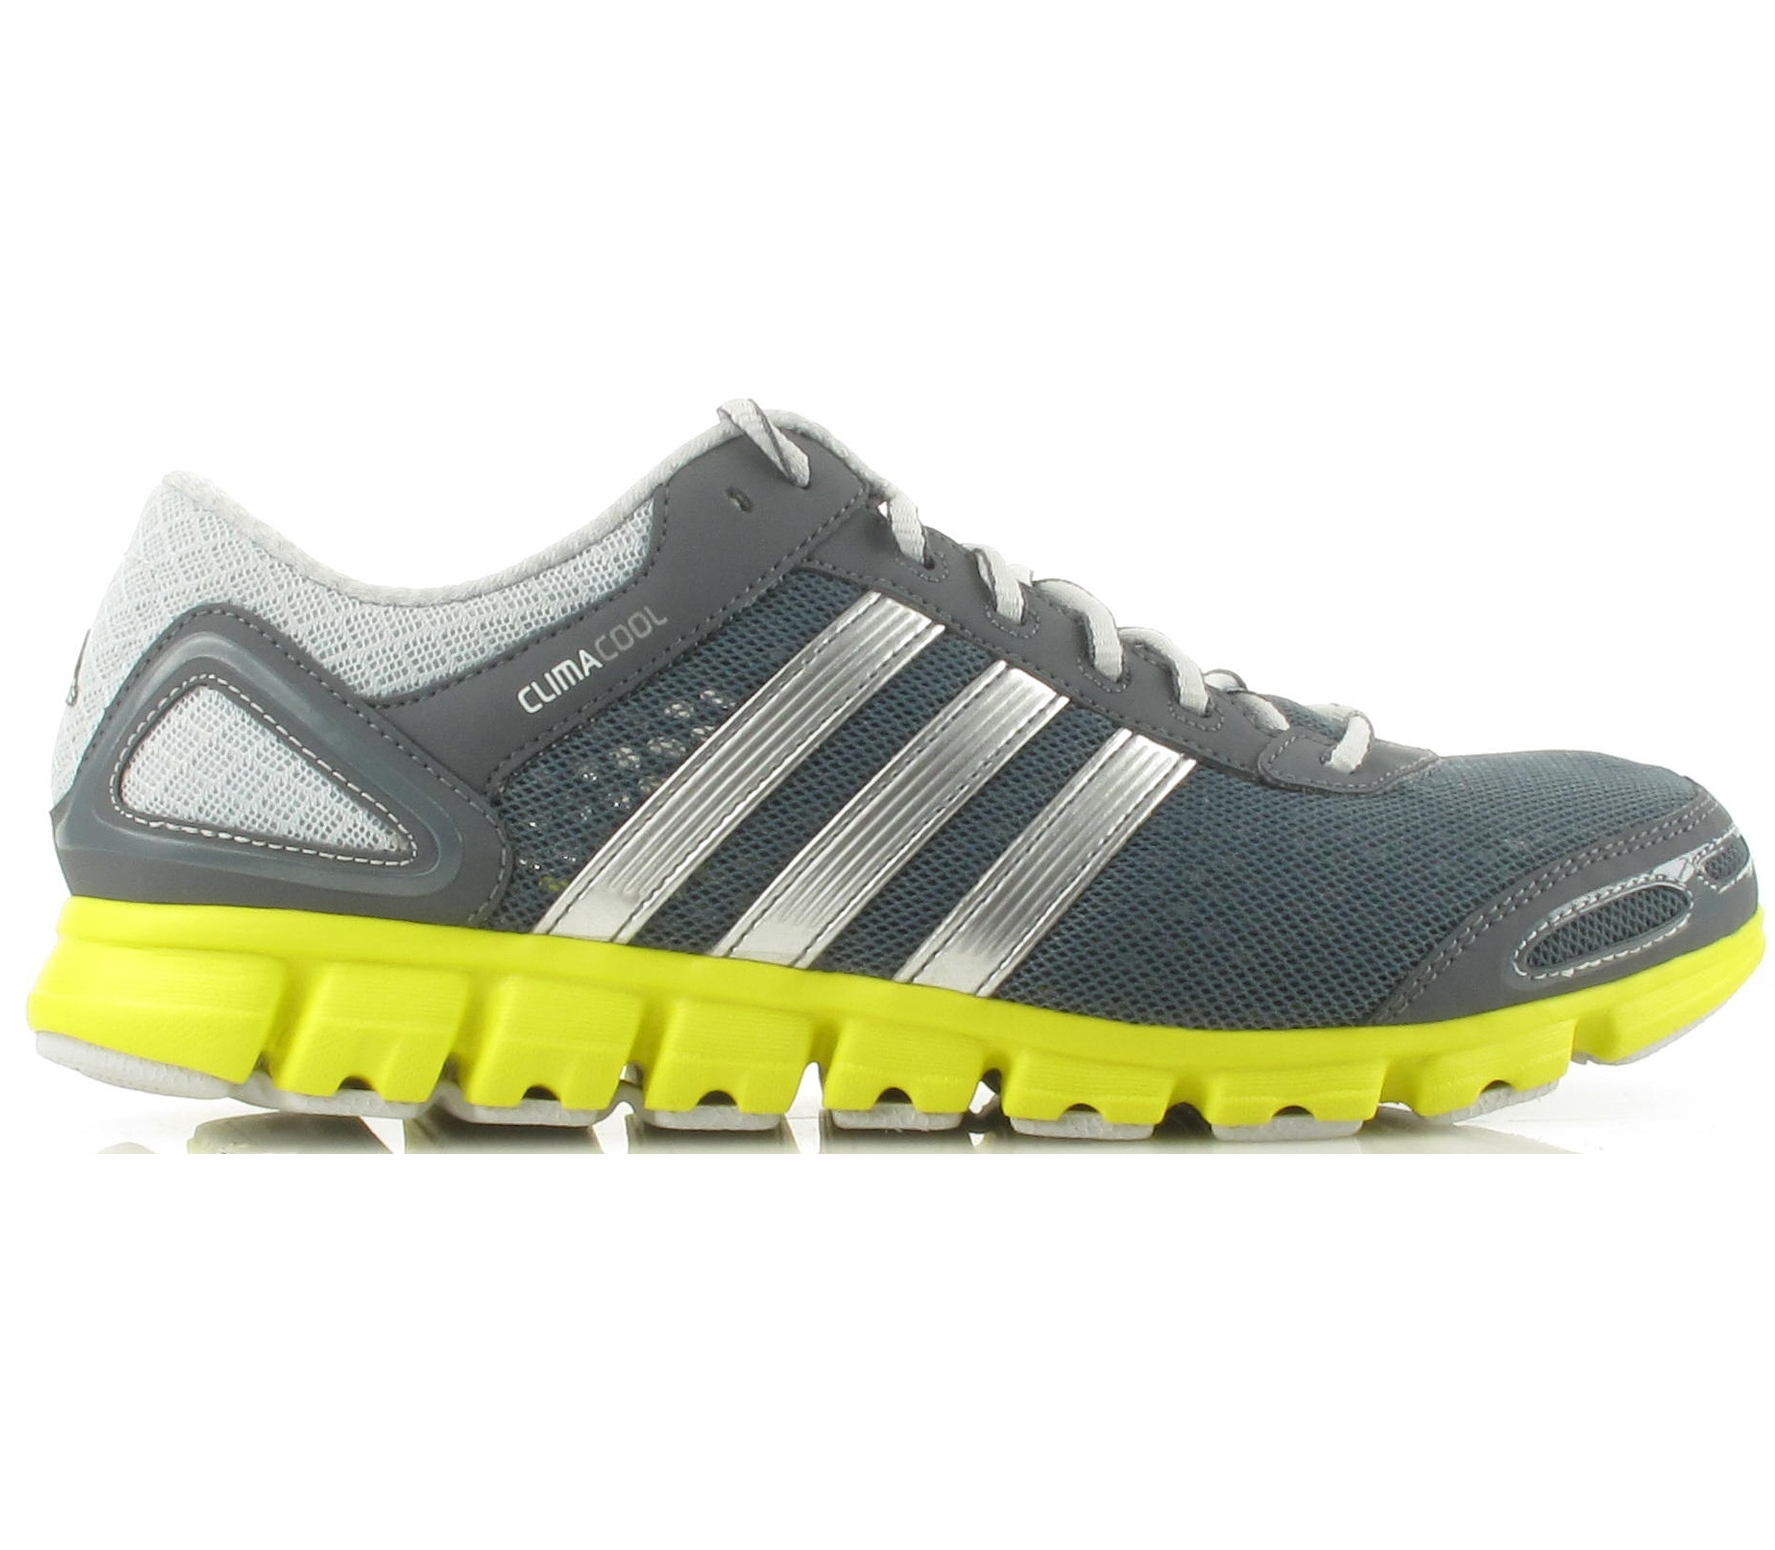 adidas-laufschuh-cc-modulate-men-gelb-silber-rscad070-1_z1